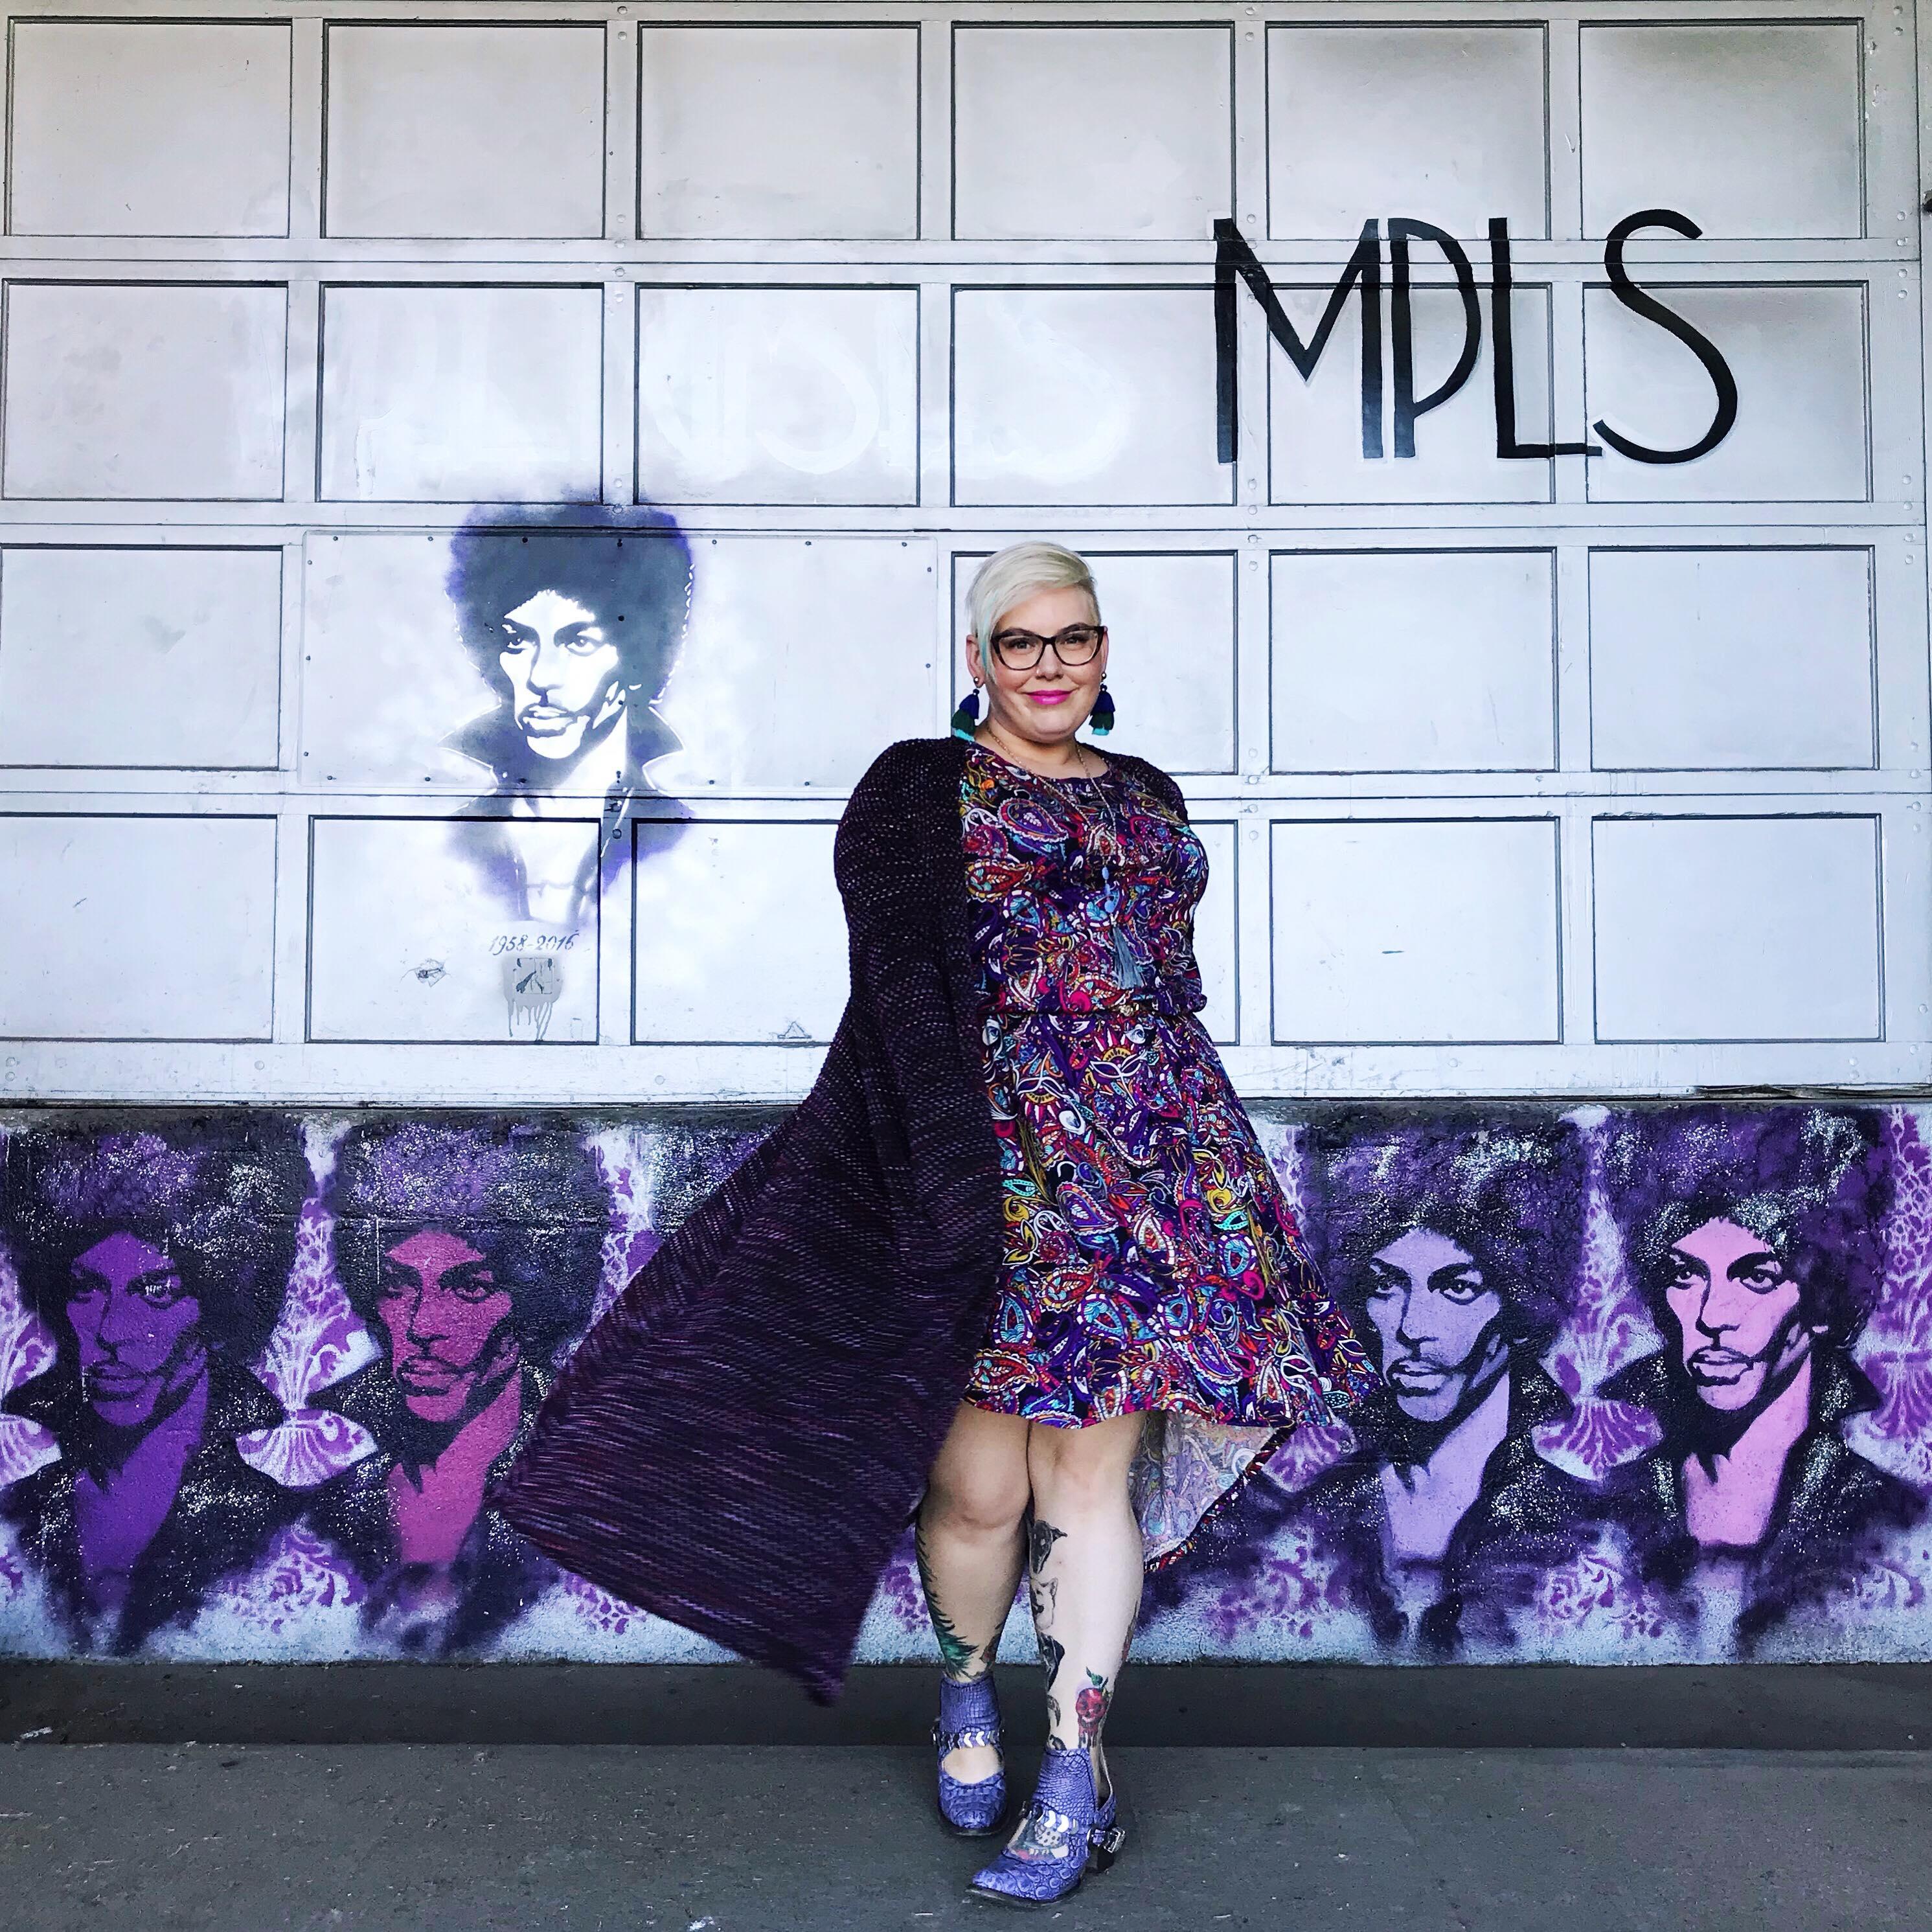 c5b136e7e492fc Small Business Spotlight: LuLaRoe with Tara #shopsmall - Mysterious ...